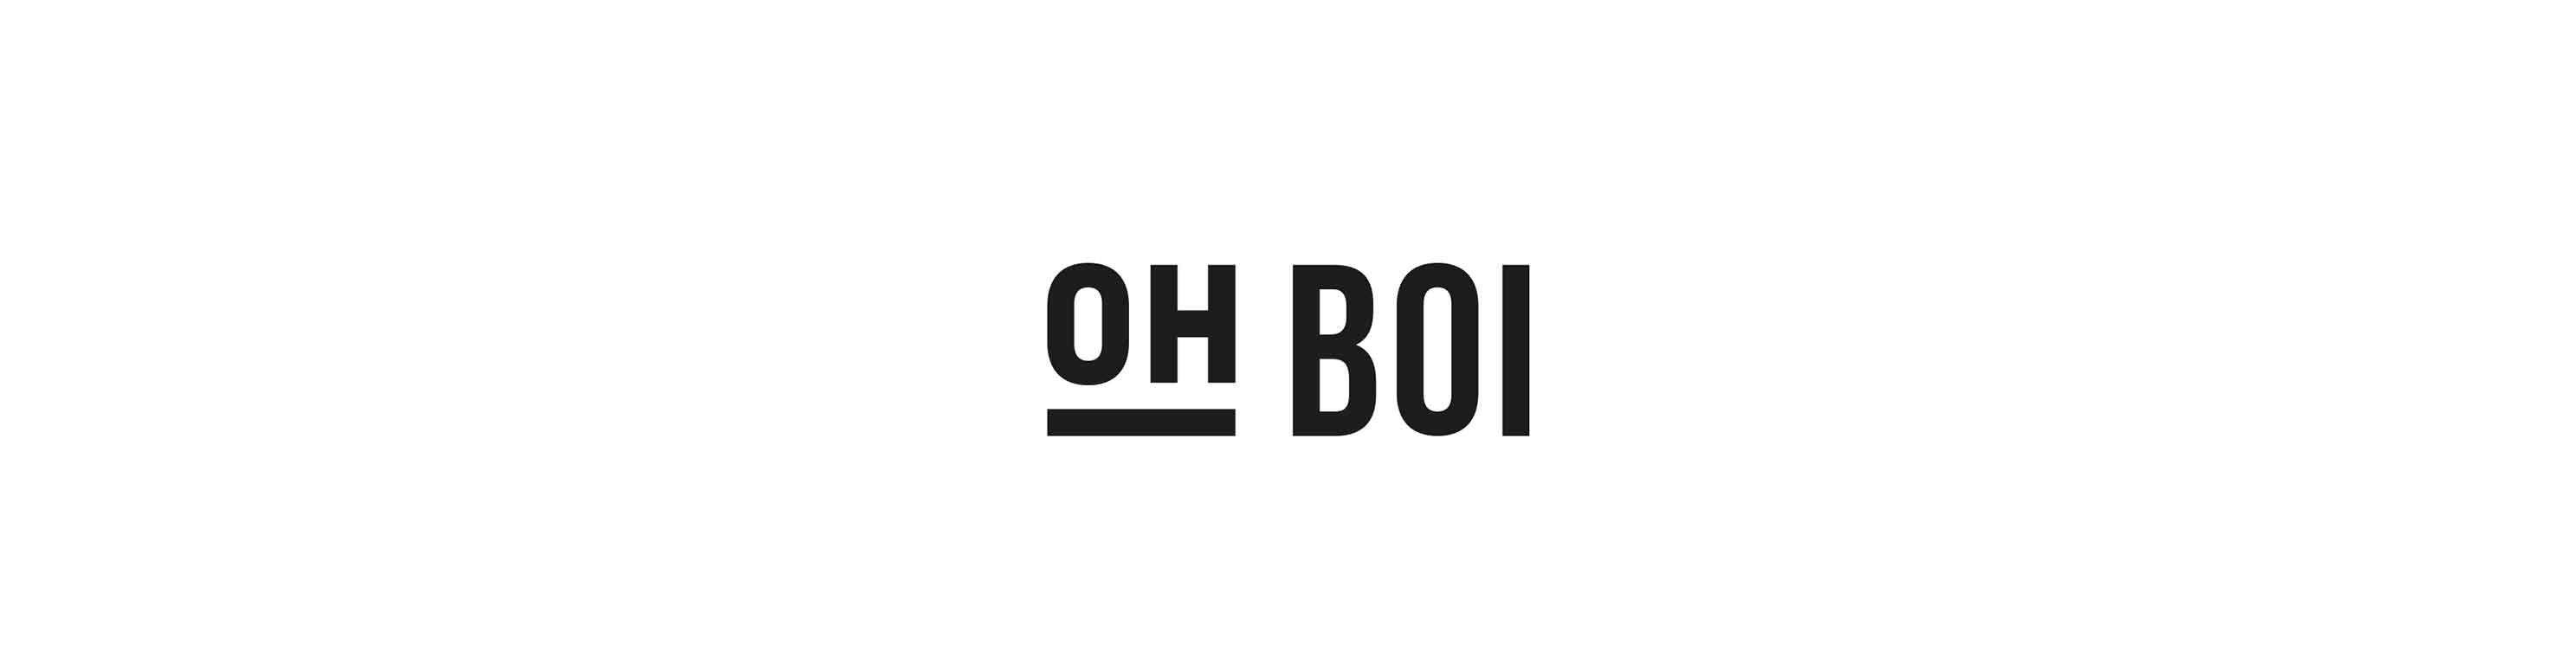 12-oh-boi-bar-food-augsburg-branding-design-logo-corporate